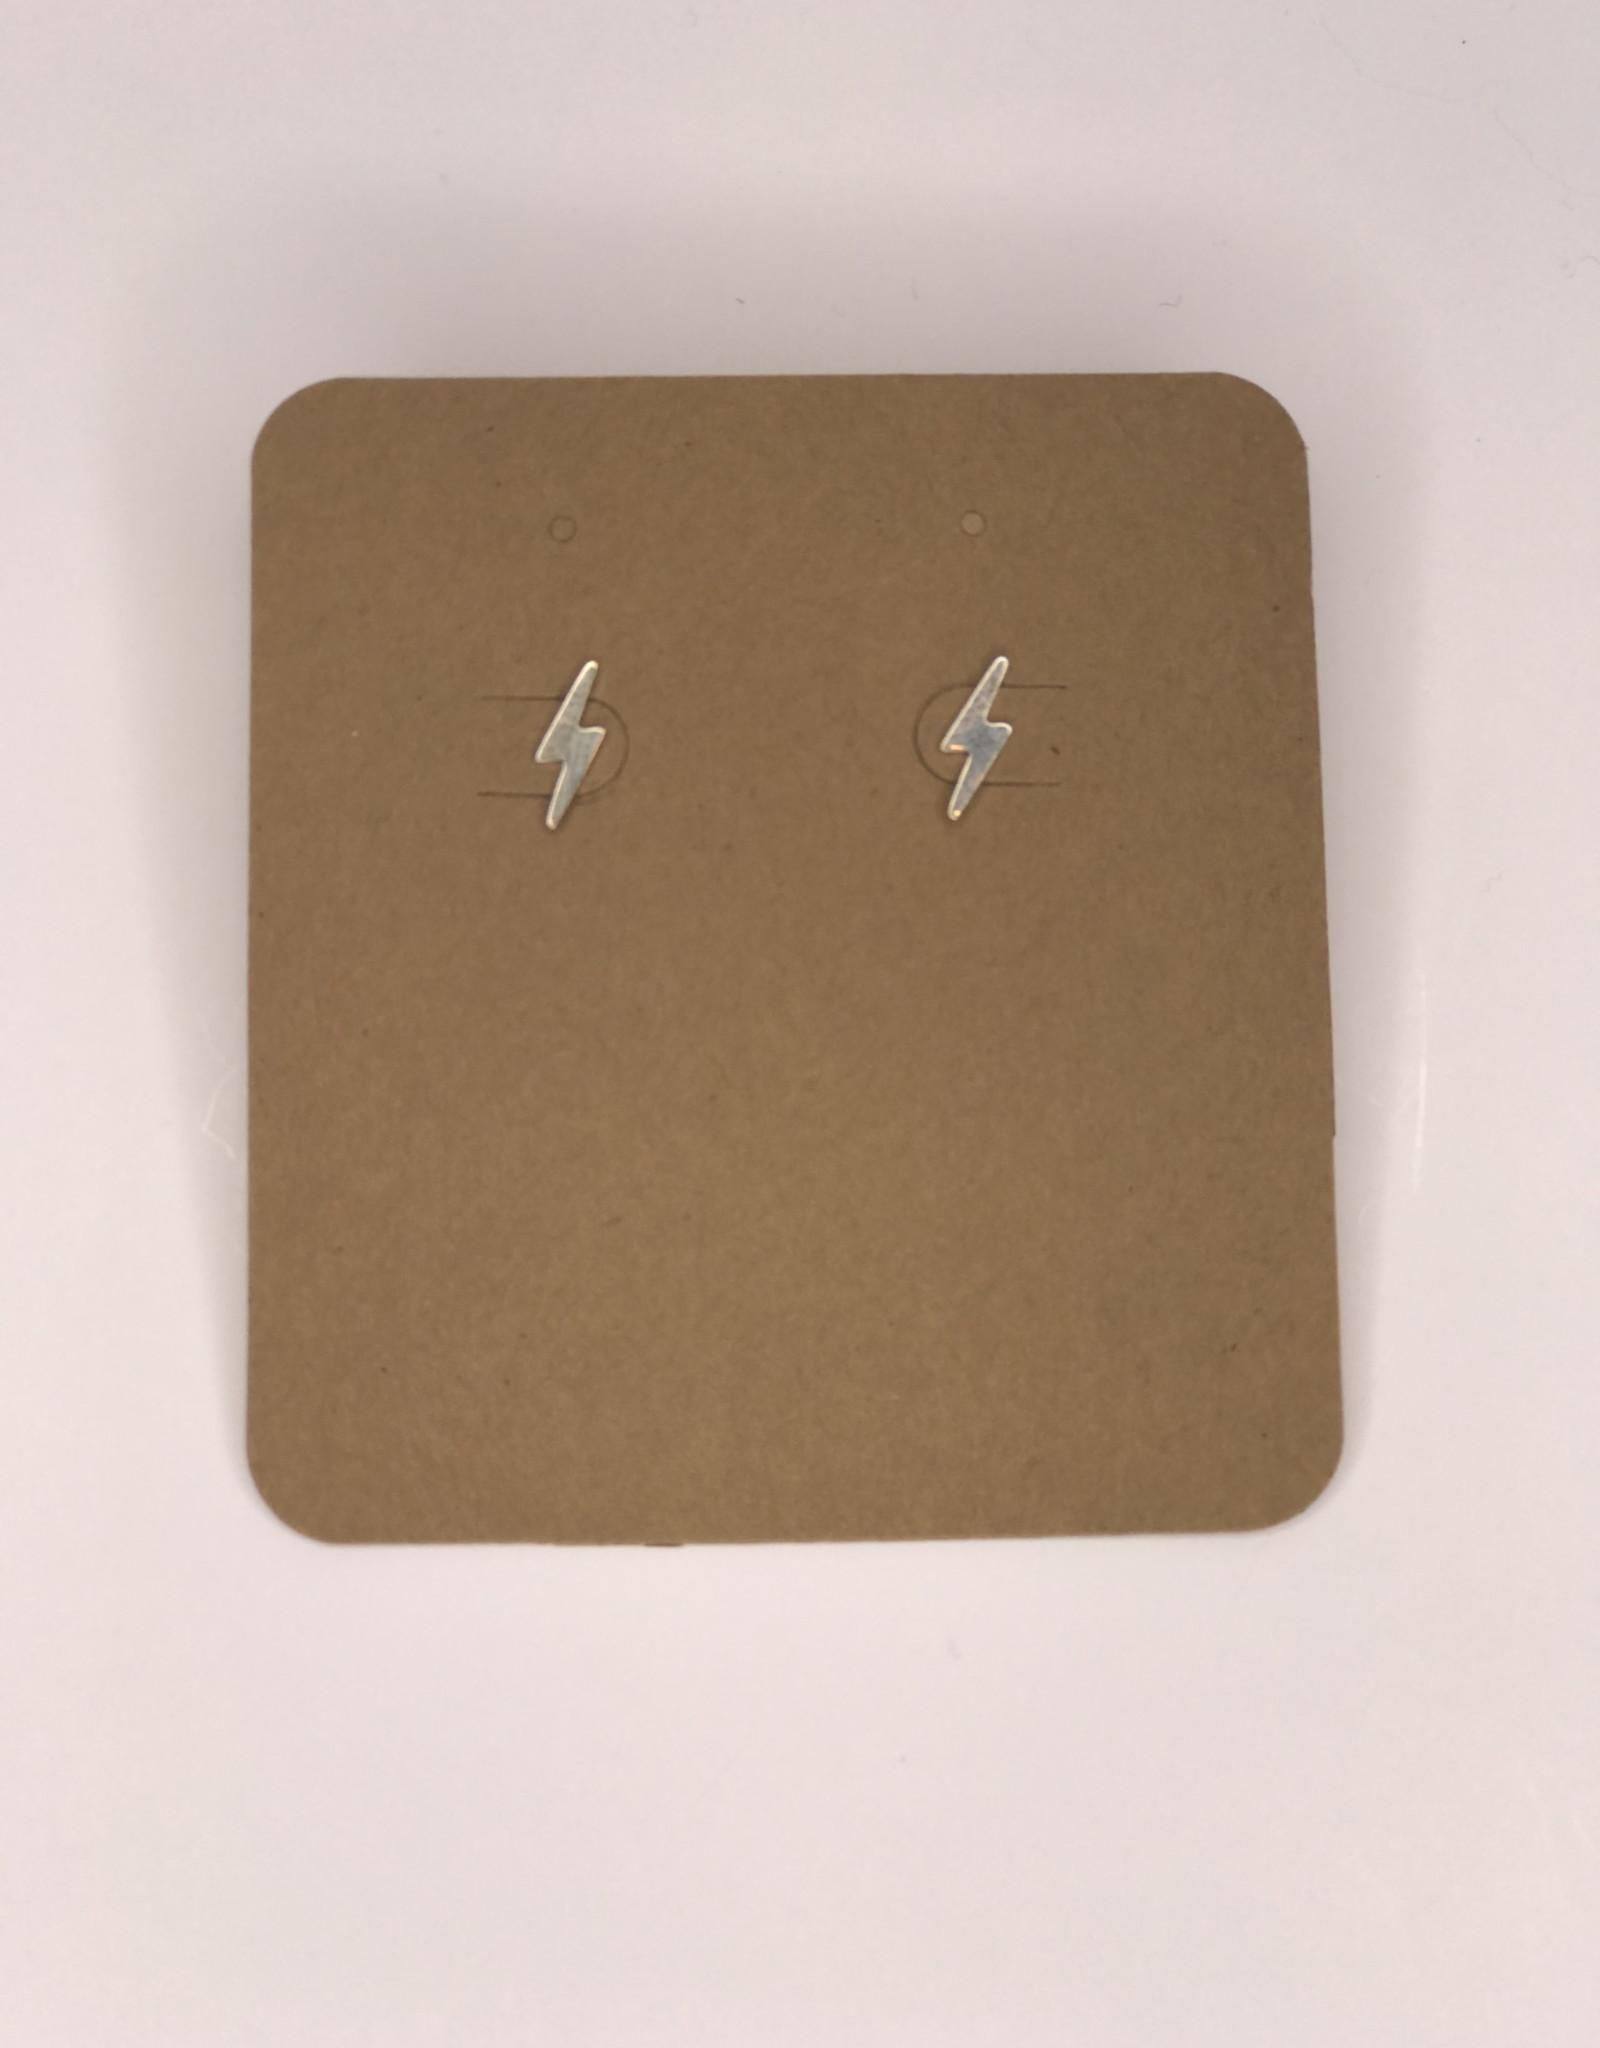 Amano Studios Earrings - Silver Lightning Bolt